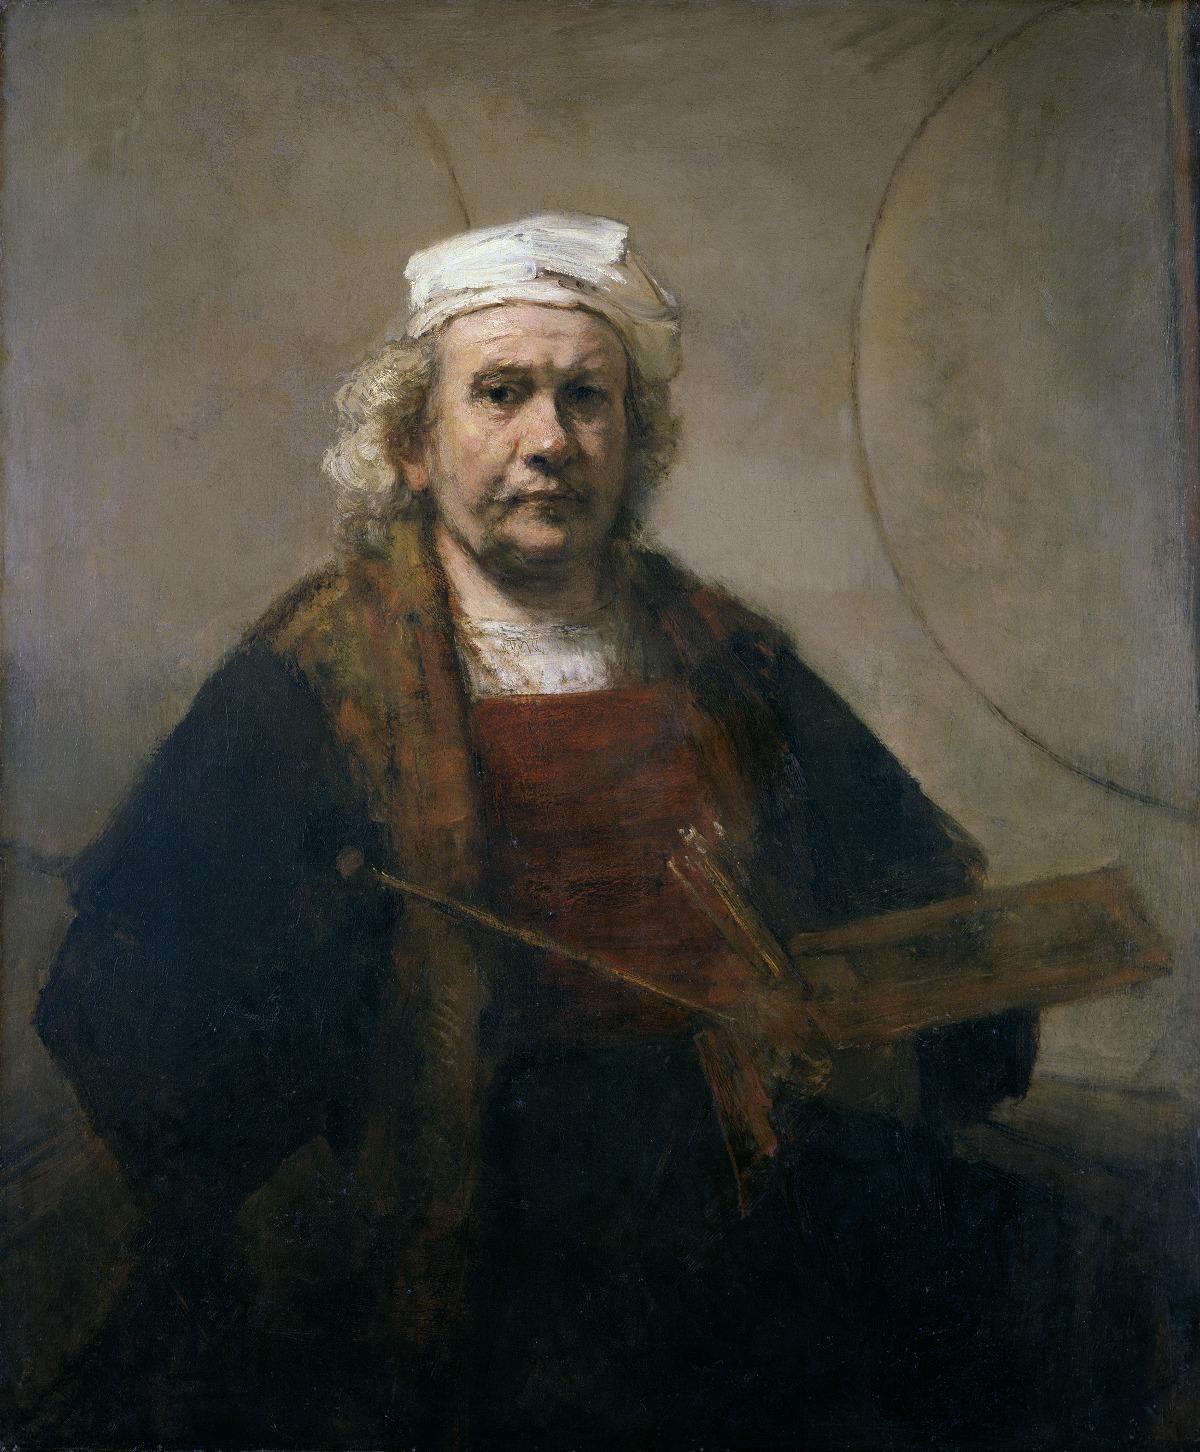 Rembrandt van Rijn Self-Portrait with Two Circles